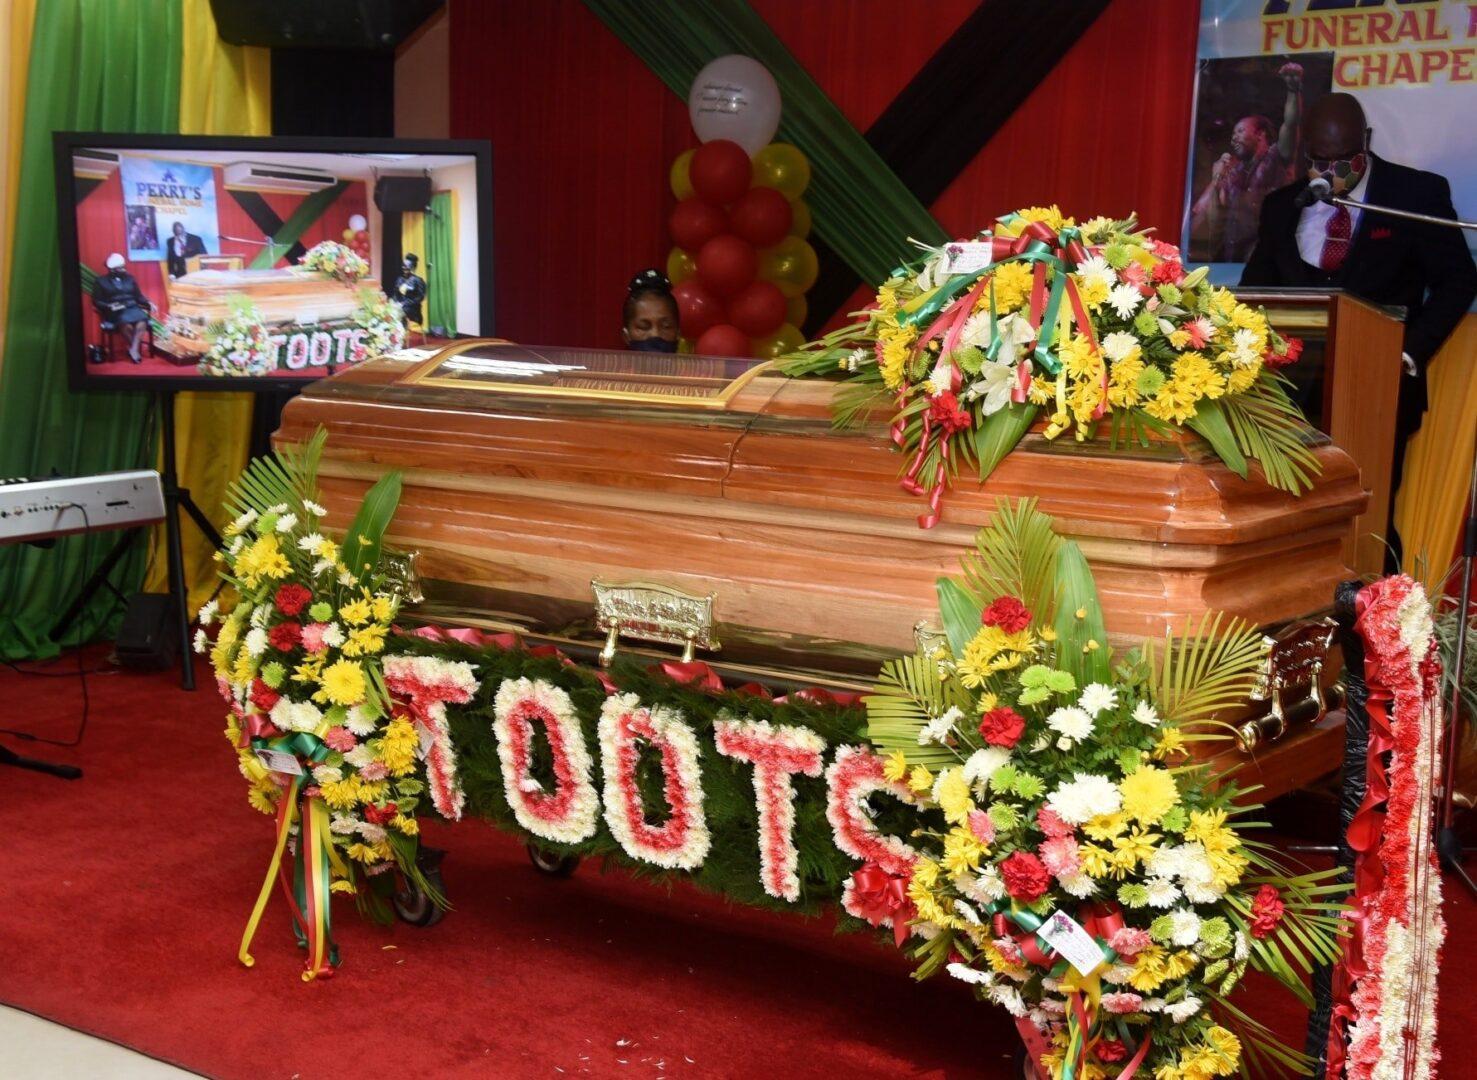 Toots Hibbert Funeral